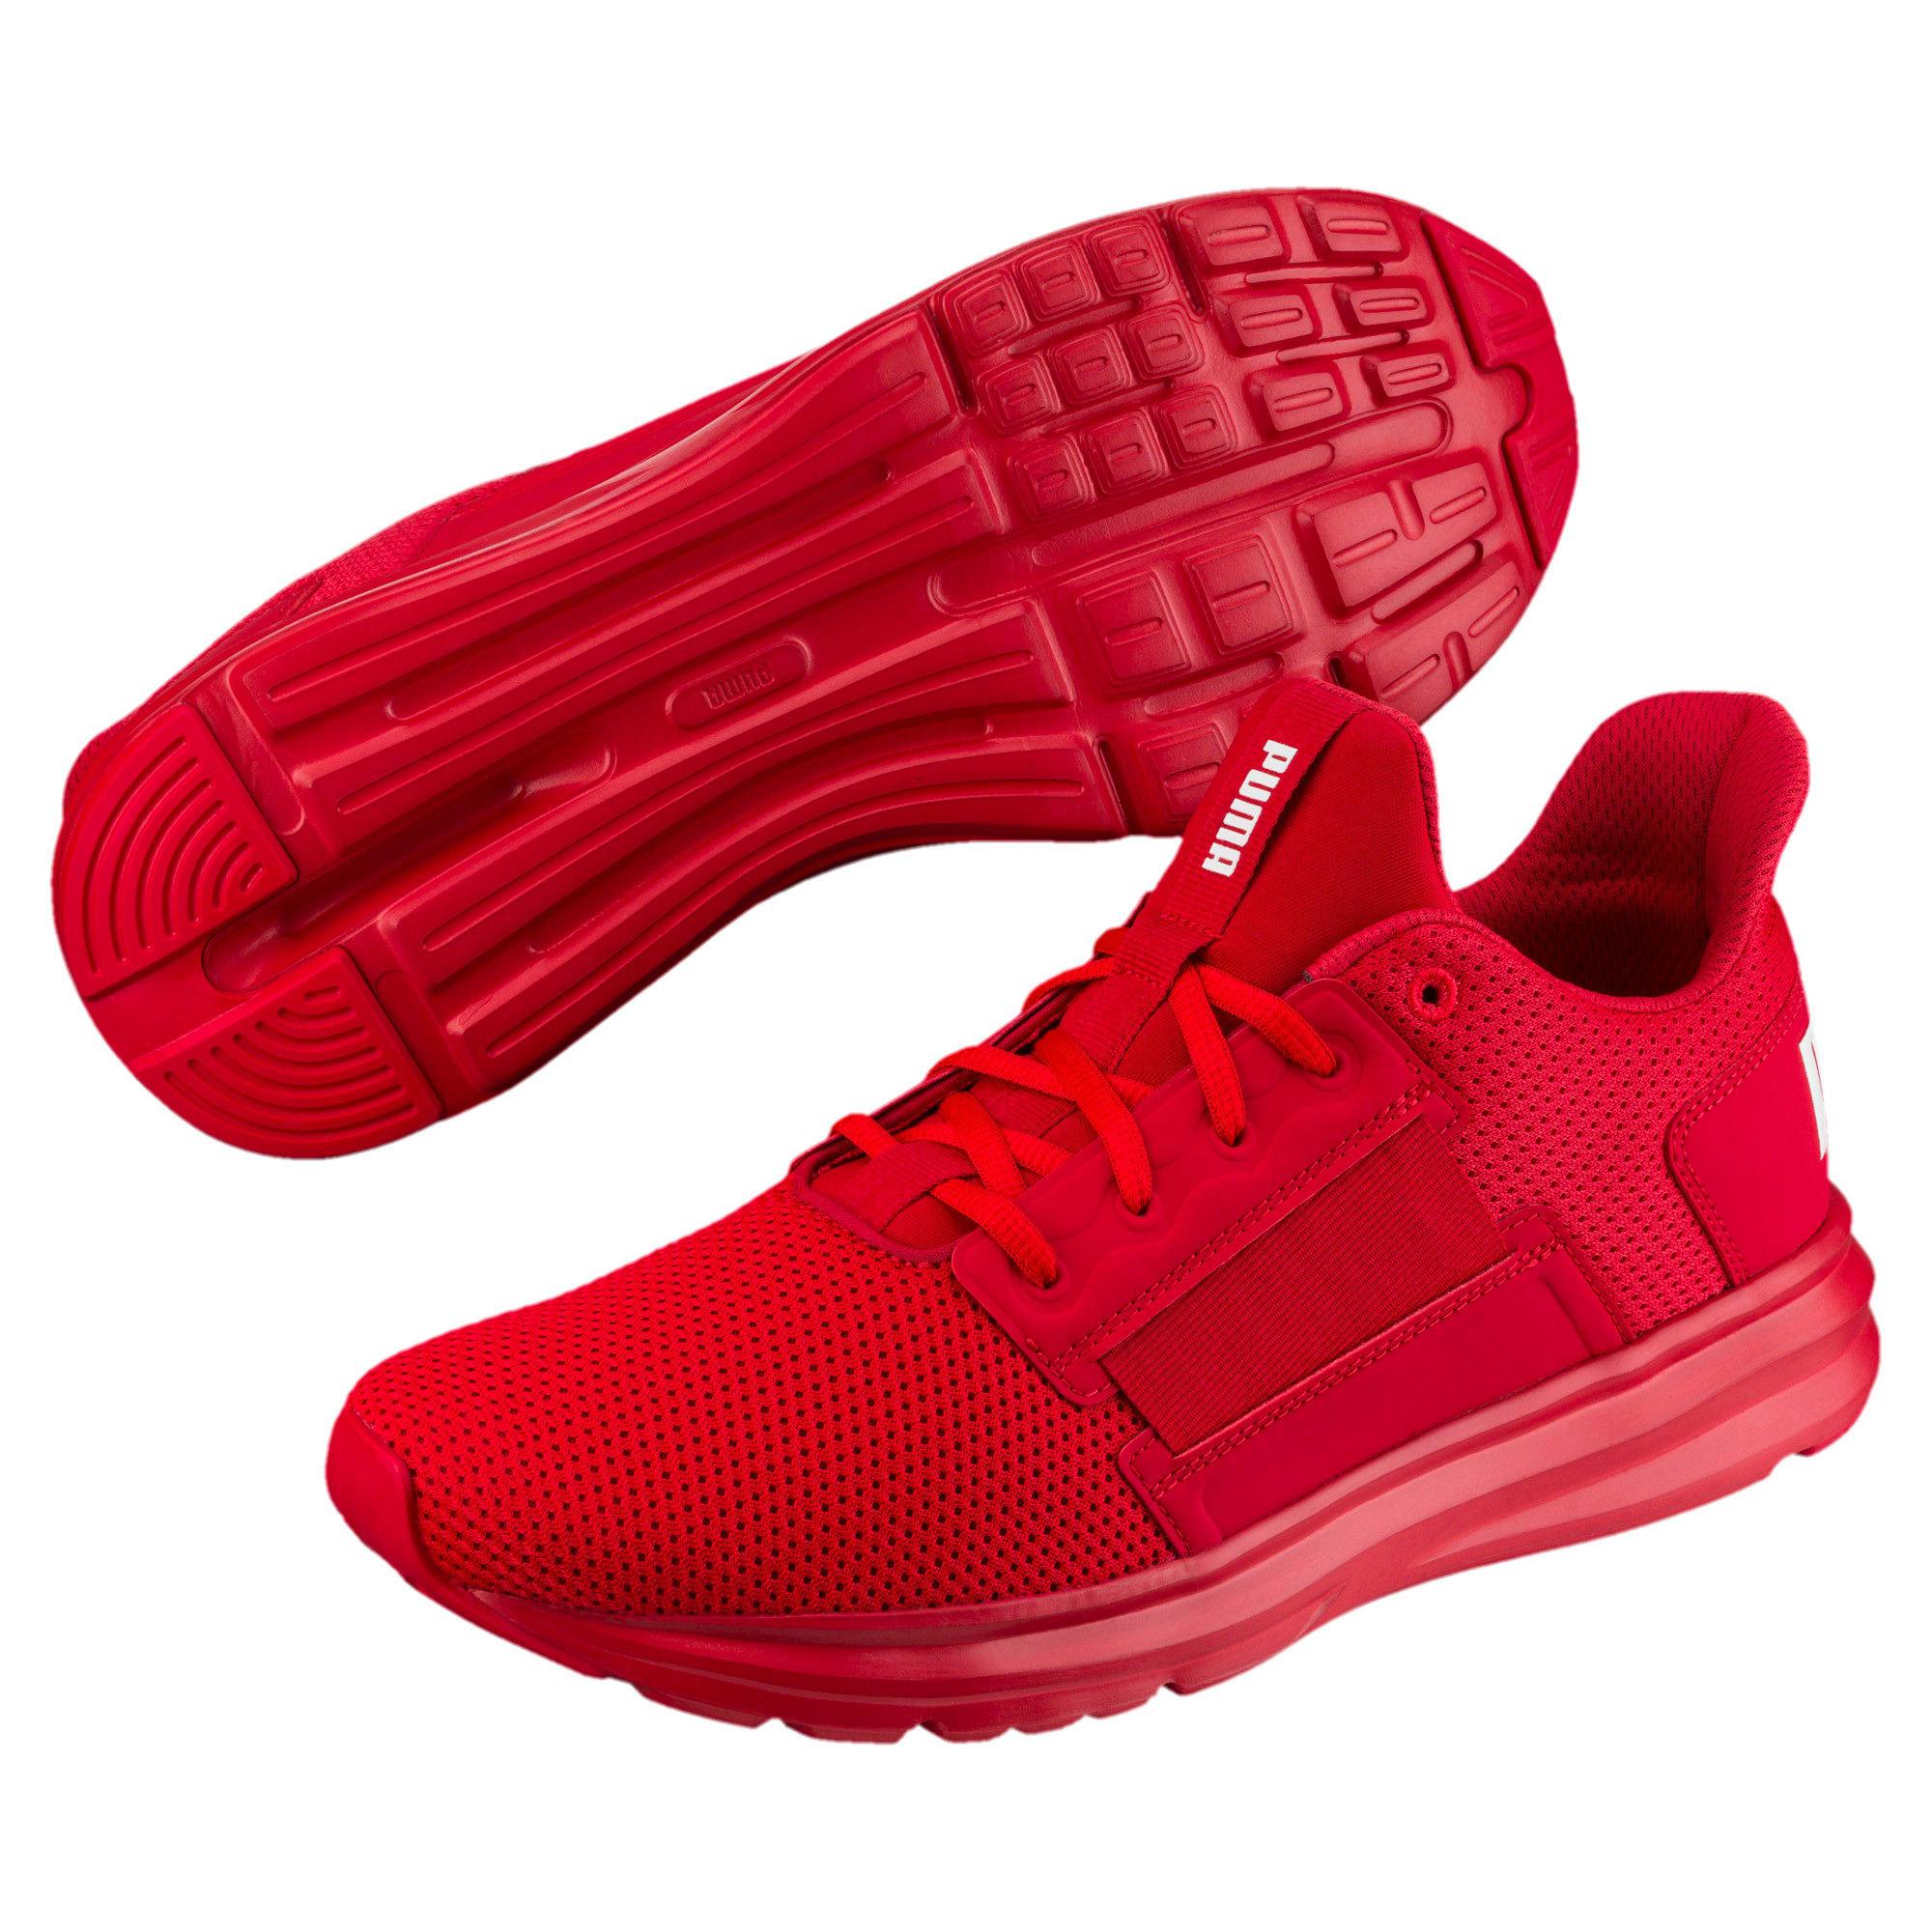 Puma donne a scegliere scarpe enzo enzo enzo street town